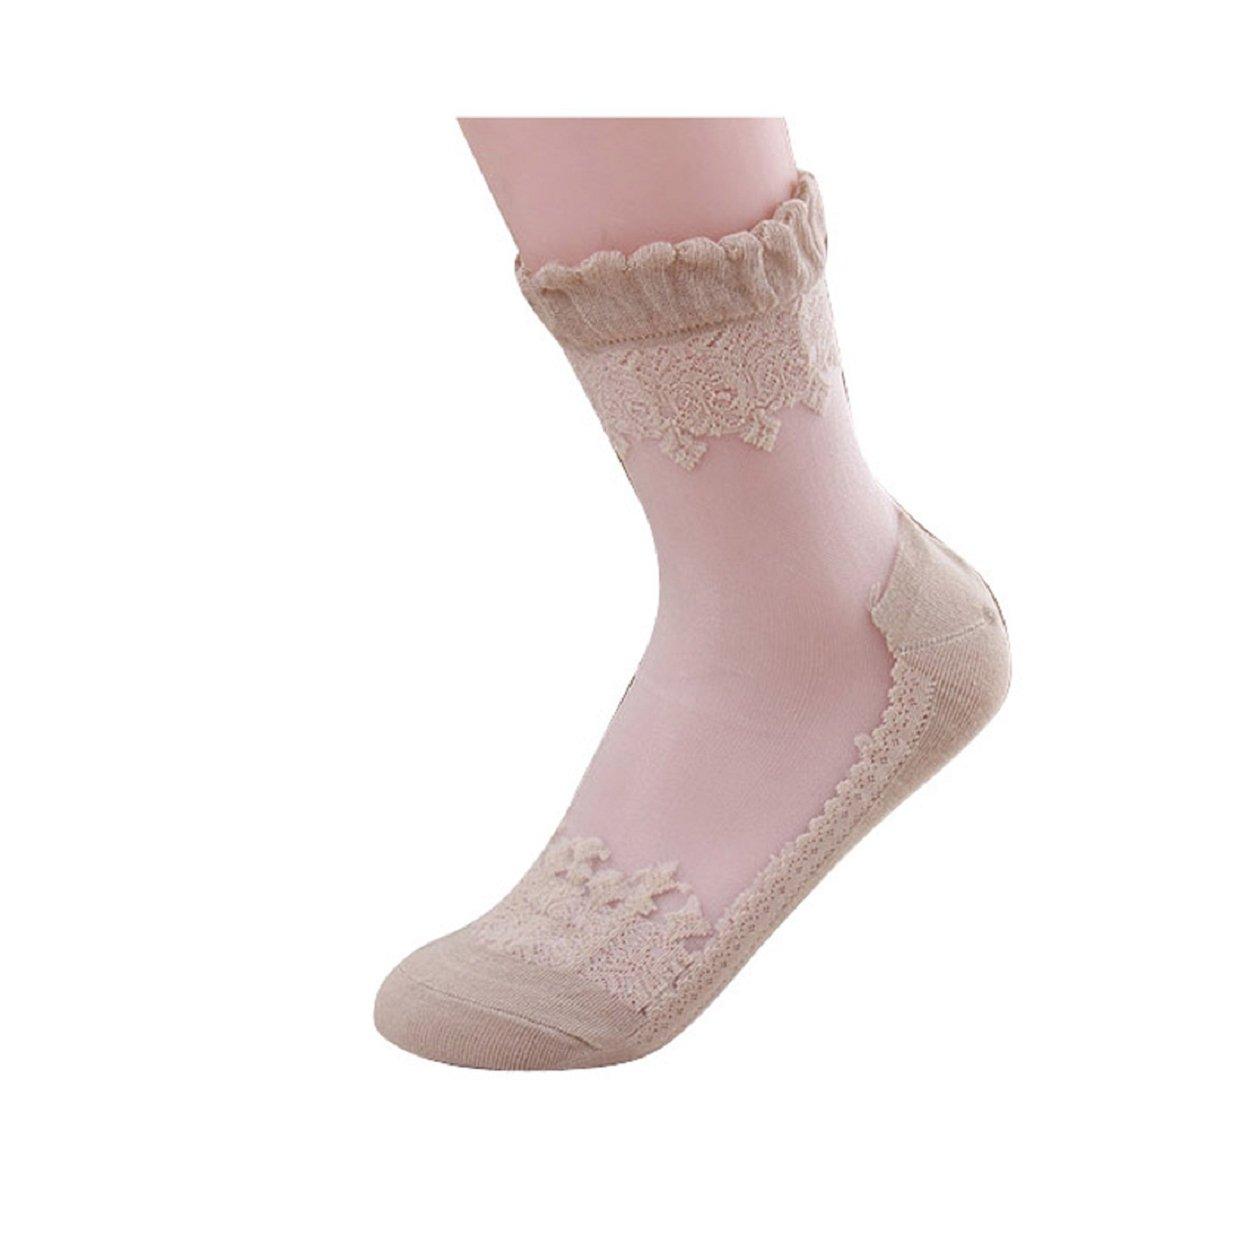 Lowpricenice(TM) Ultrathin Transparent Beautiful Crystal Lace Elastic Short Socks (Black)